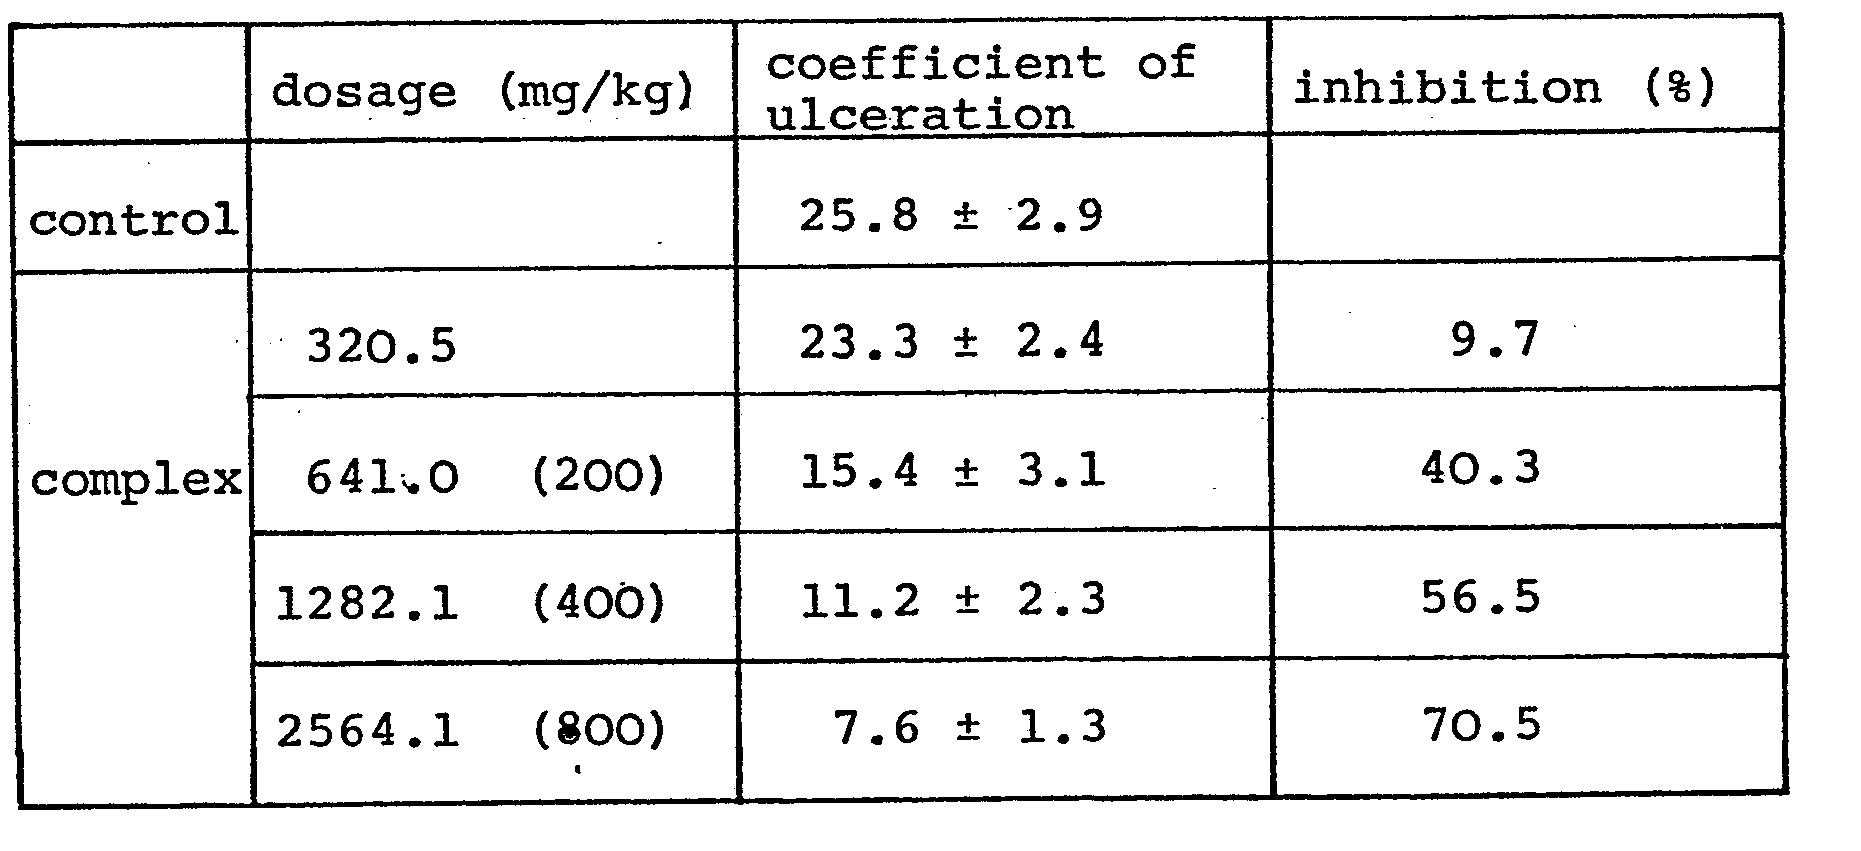 eq dosage with test